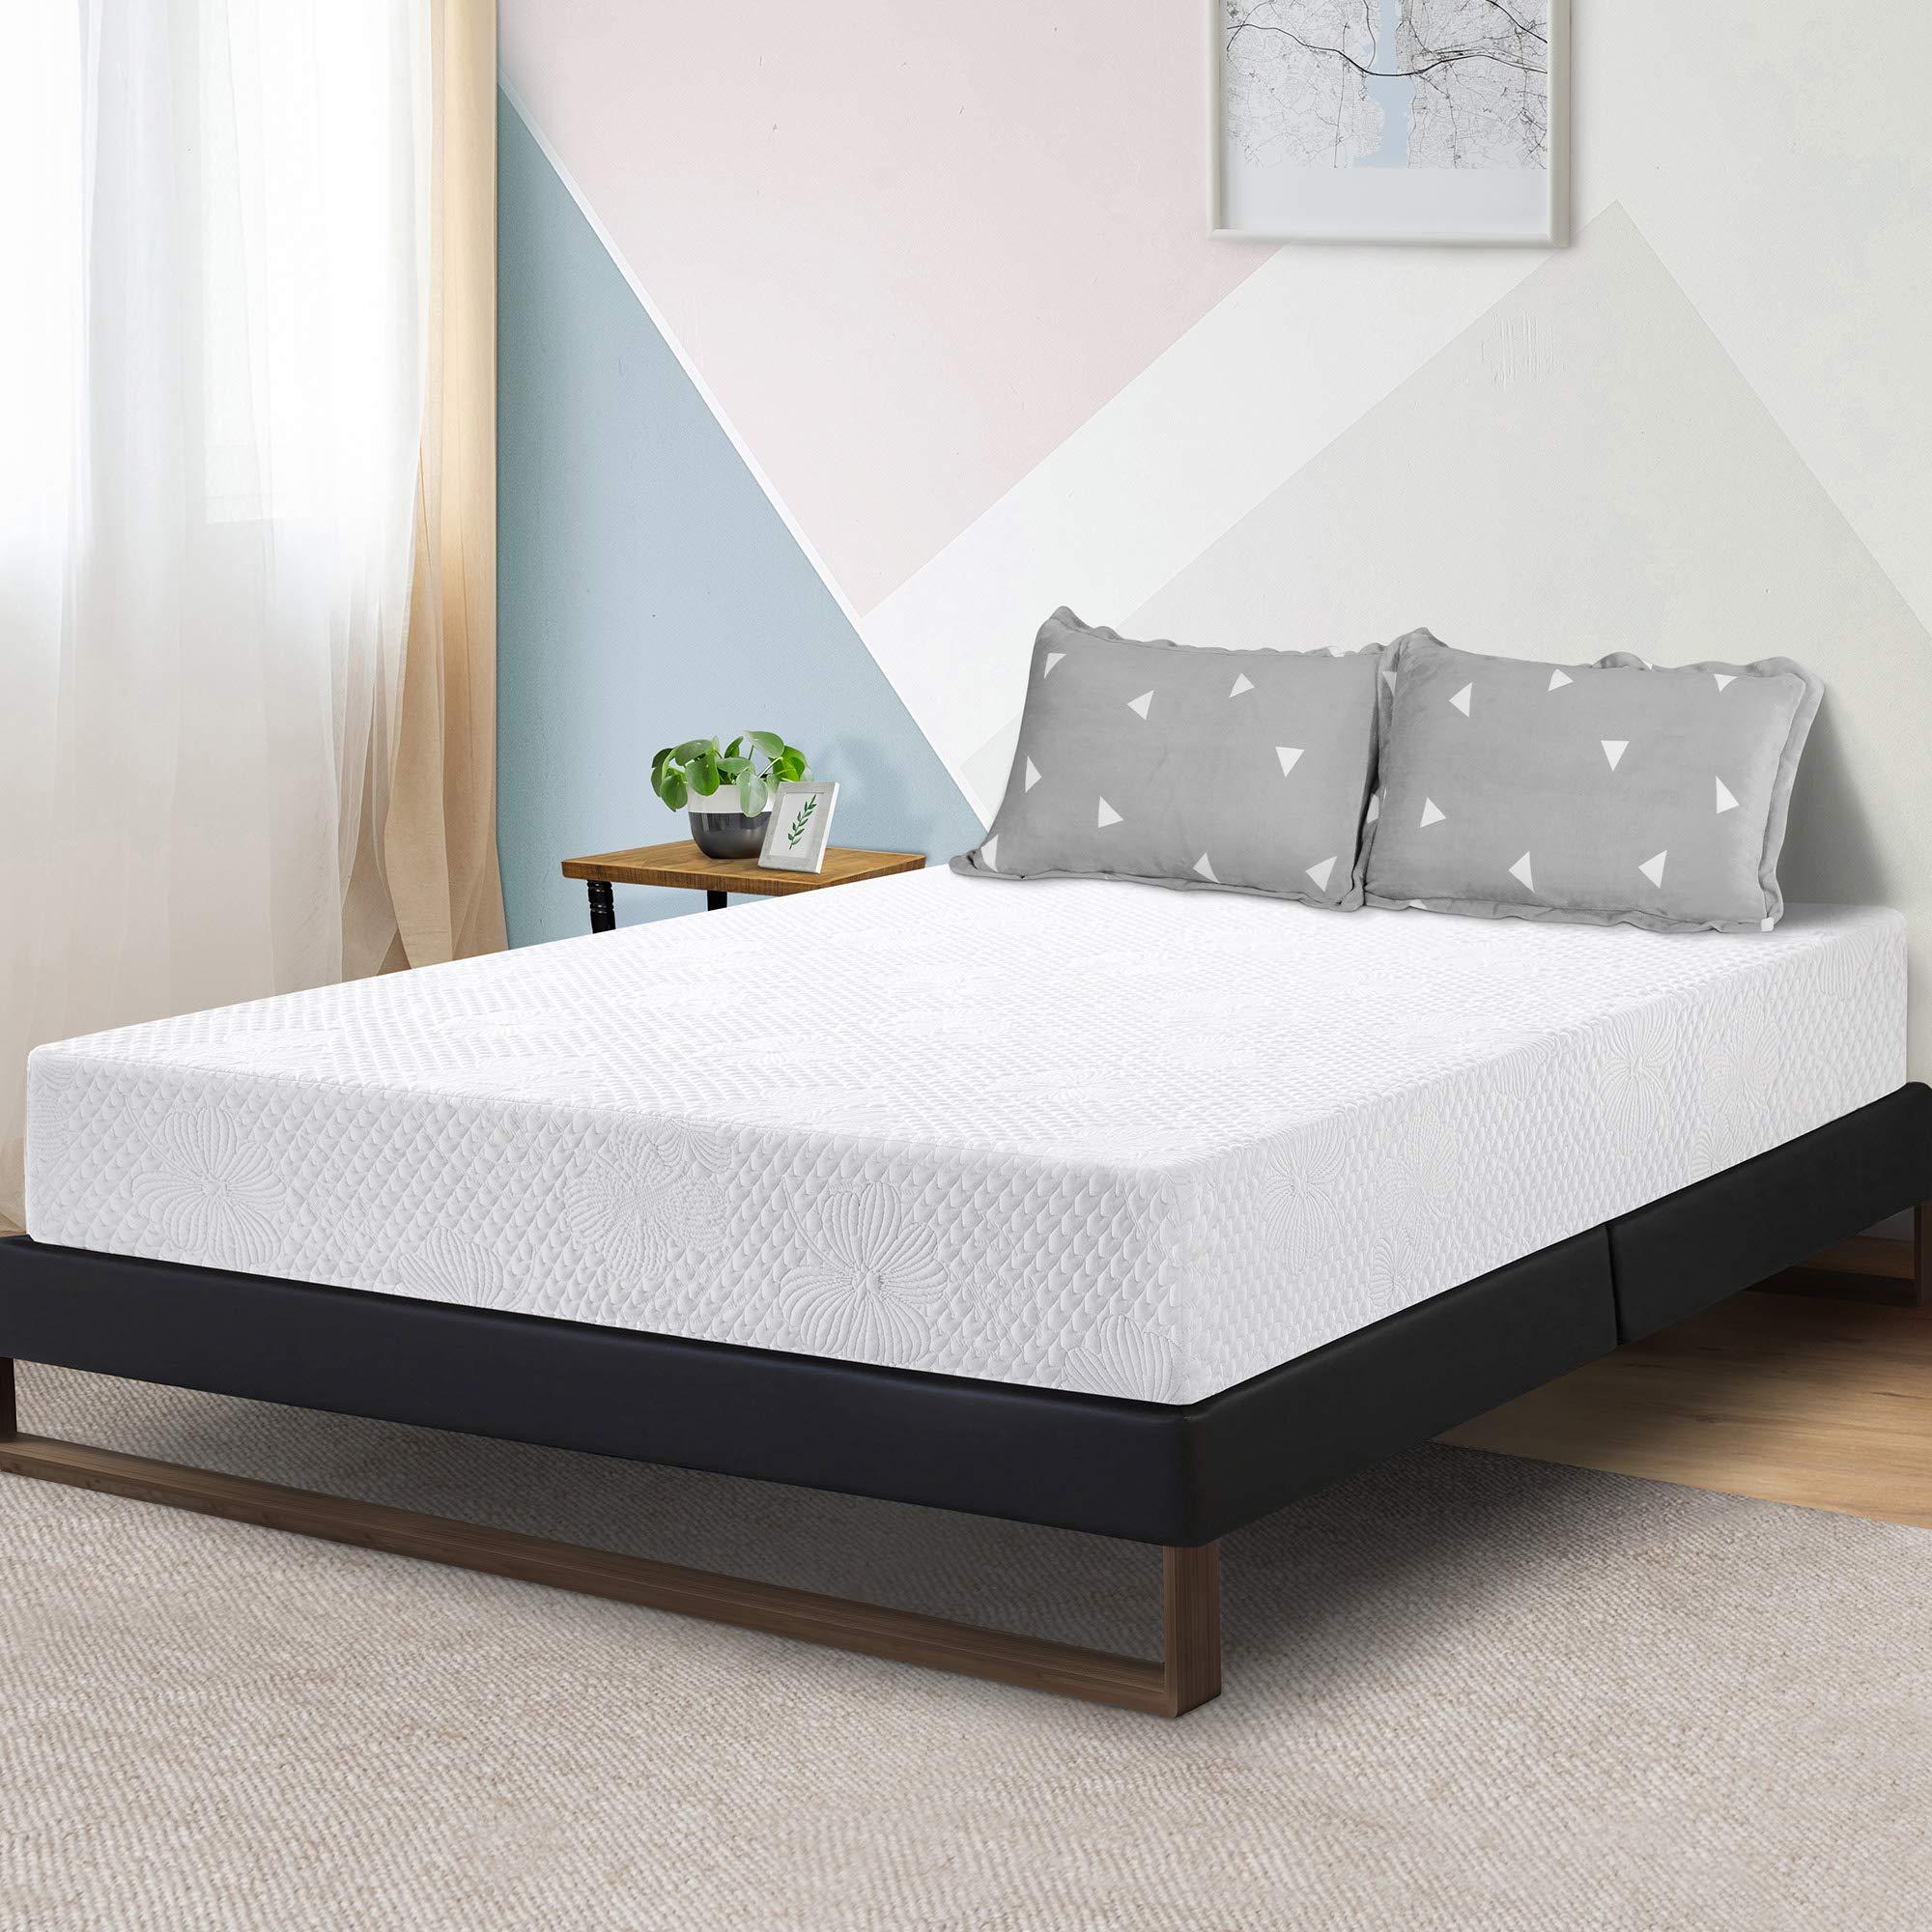 Olee Sleep 8 Inch Ventilated Convolution Memory Foam Mattress 08FM01F